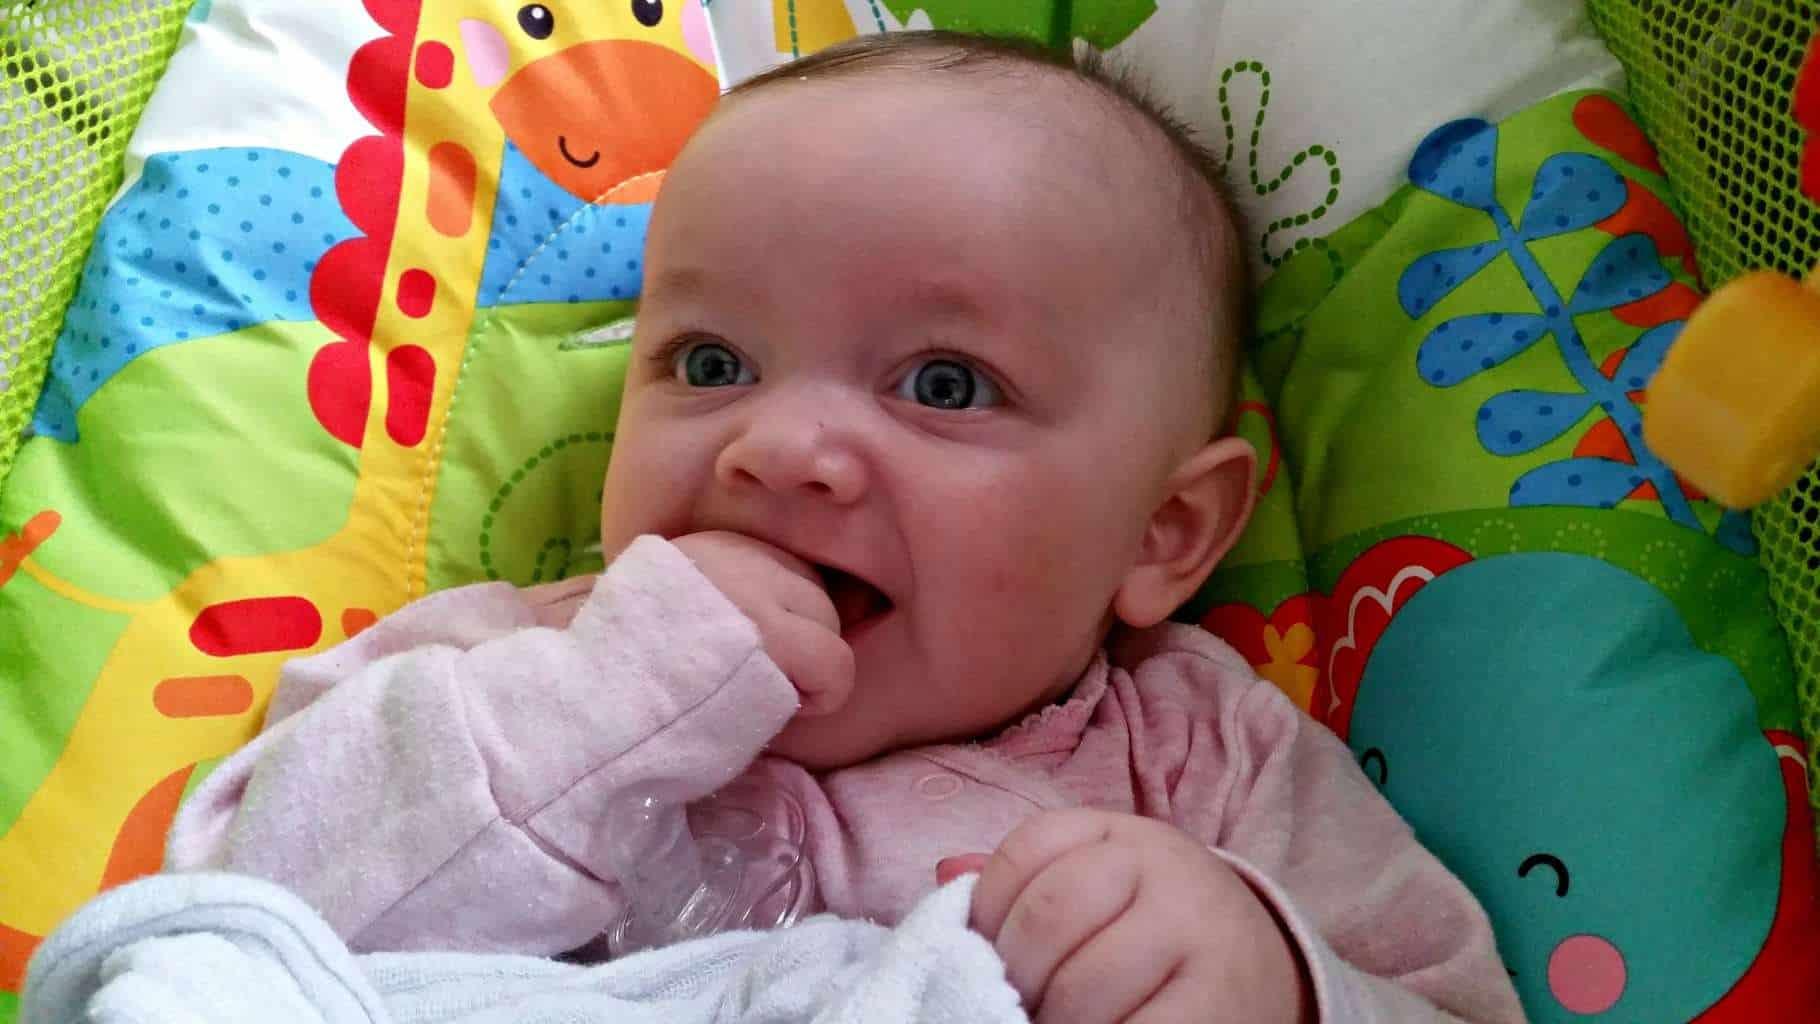 Piglet – Four Months Old